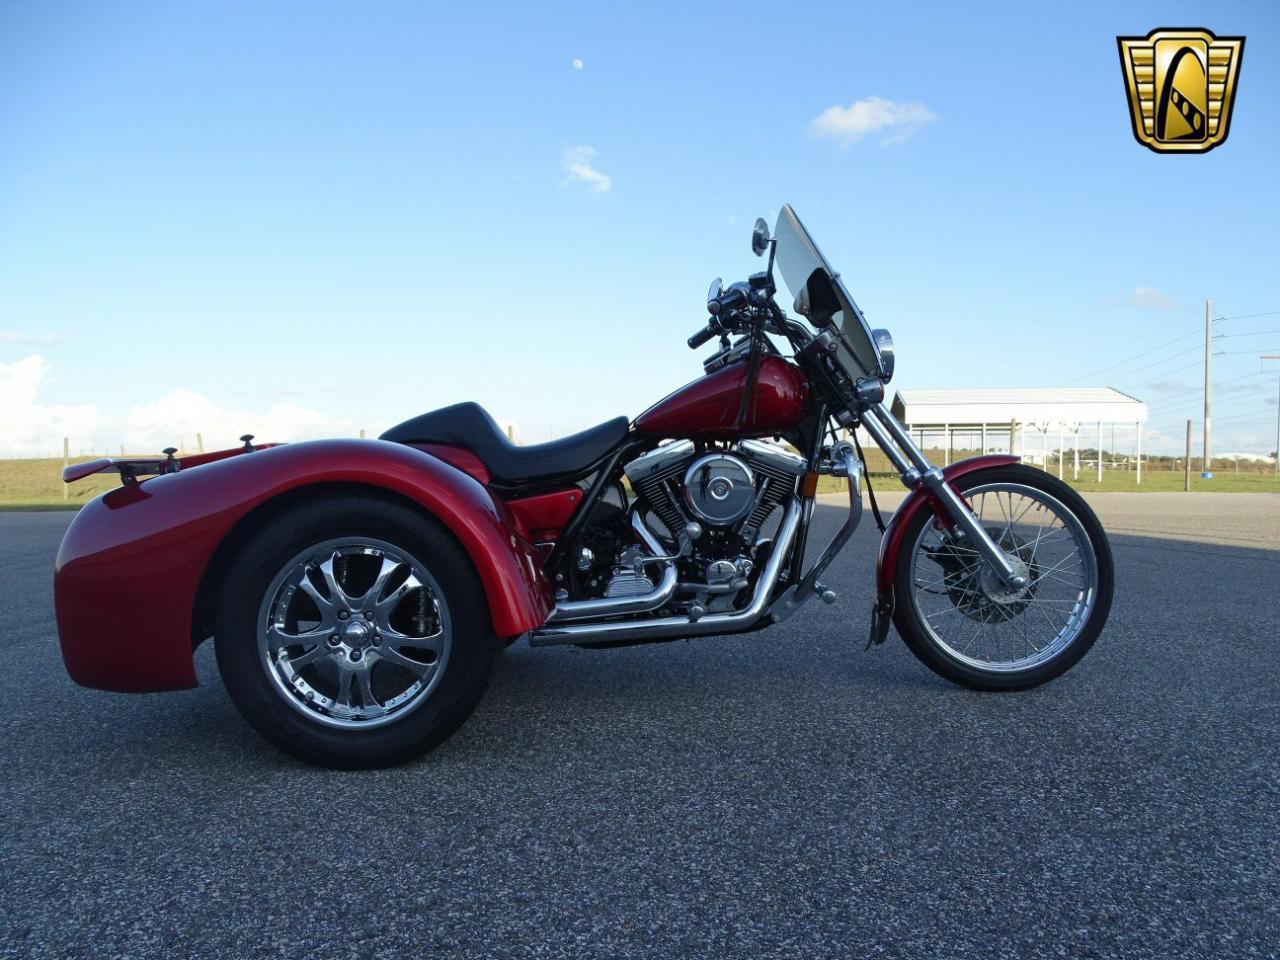 For Sale: 1999 Harley Davidson FXR2 in Ruskin, Florida